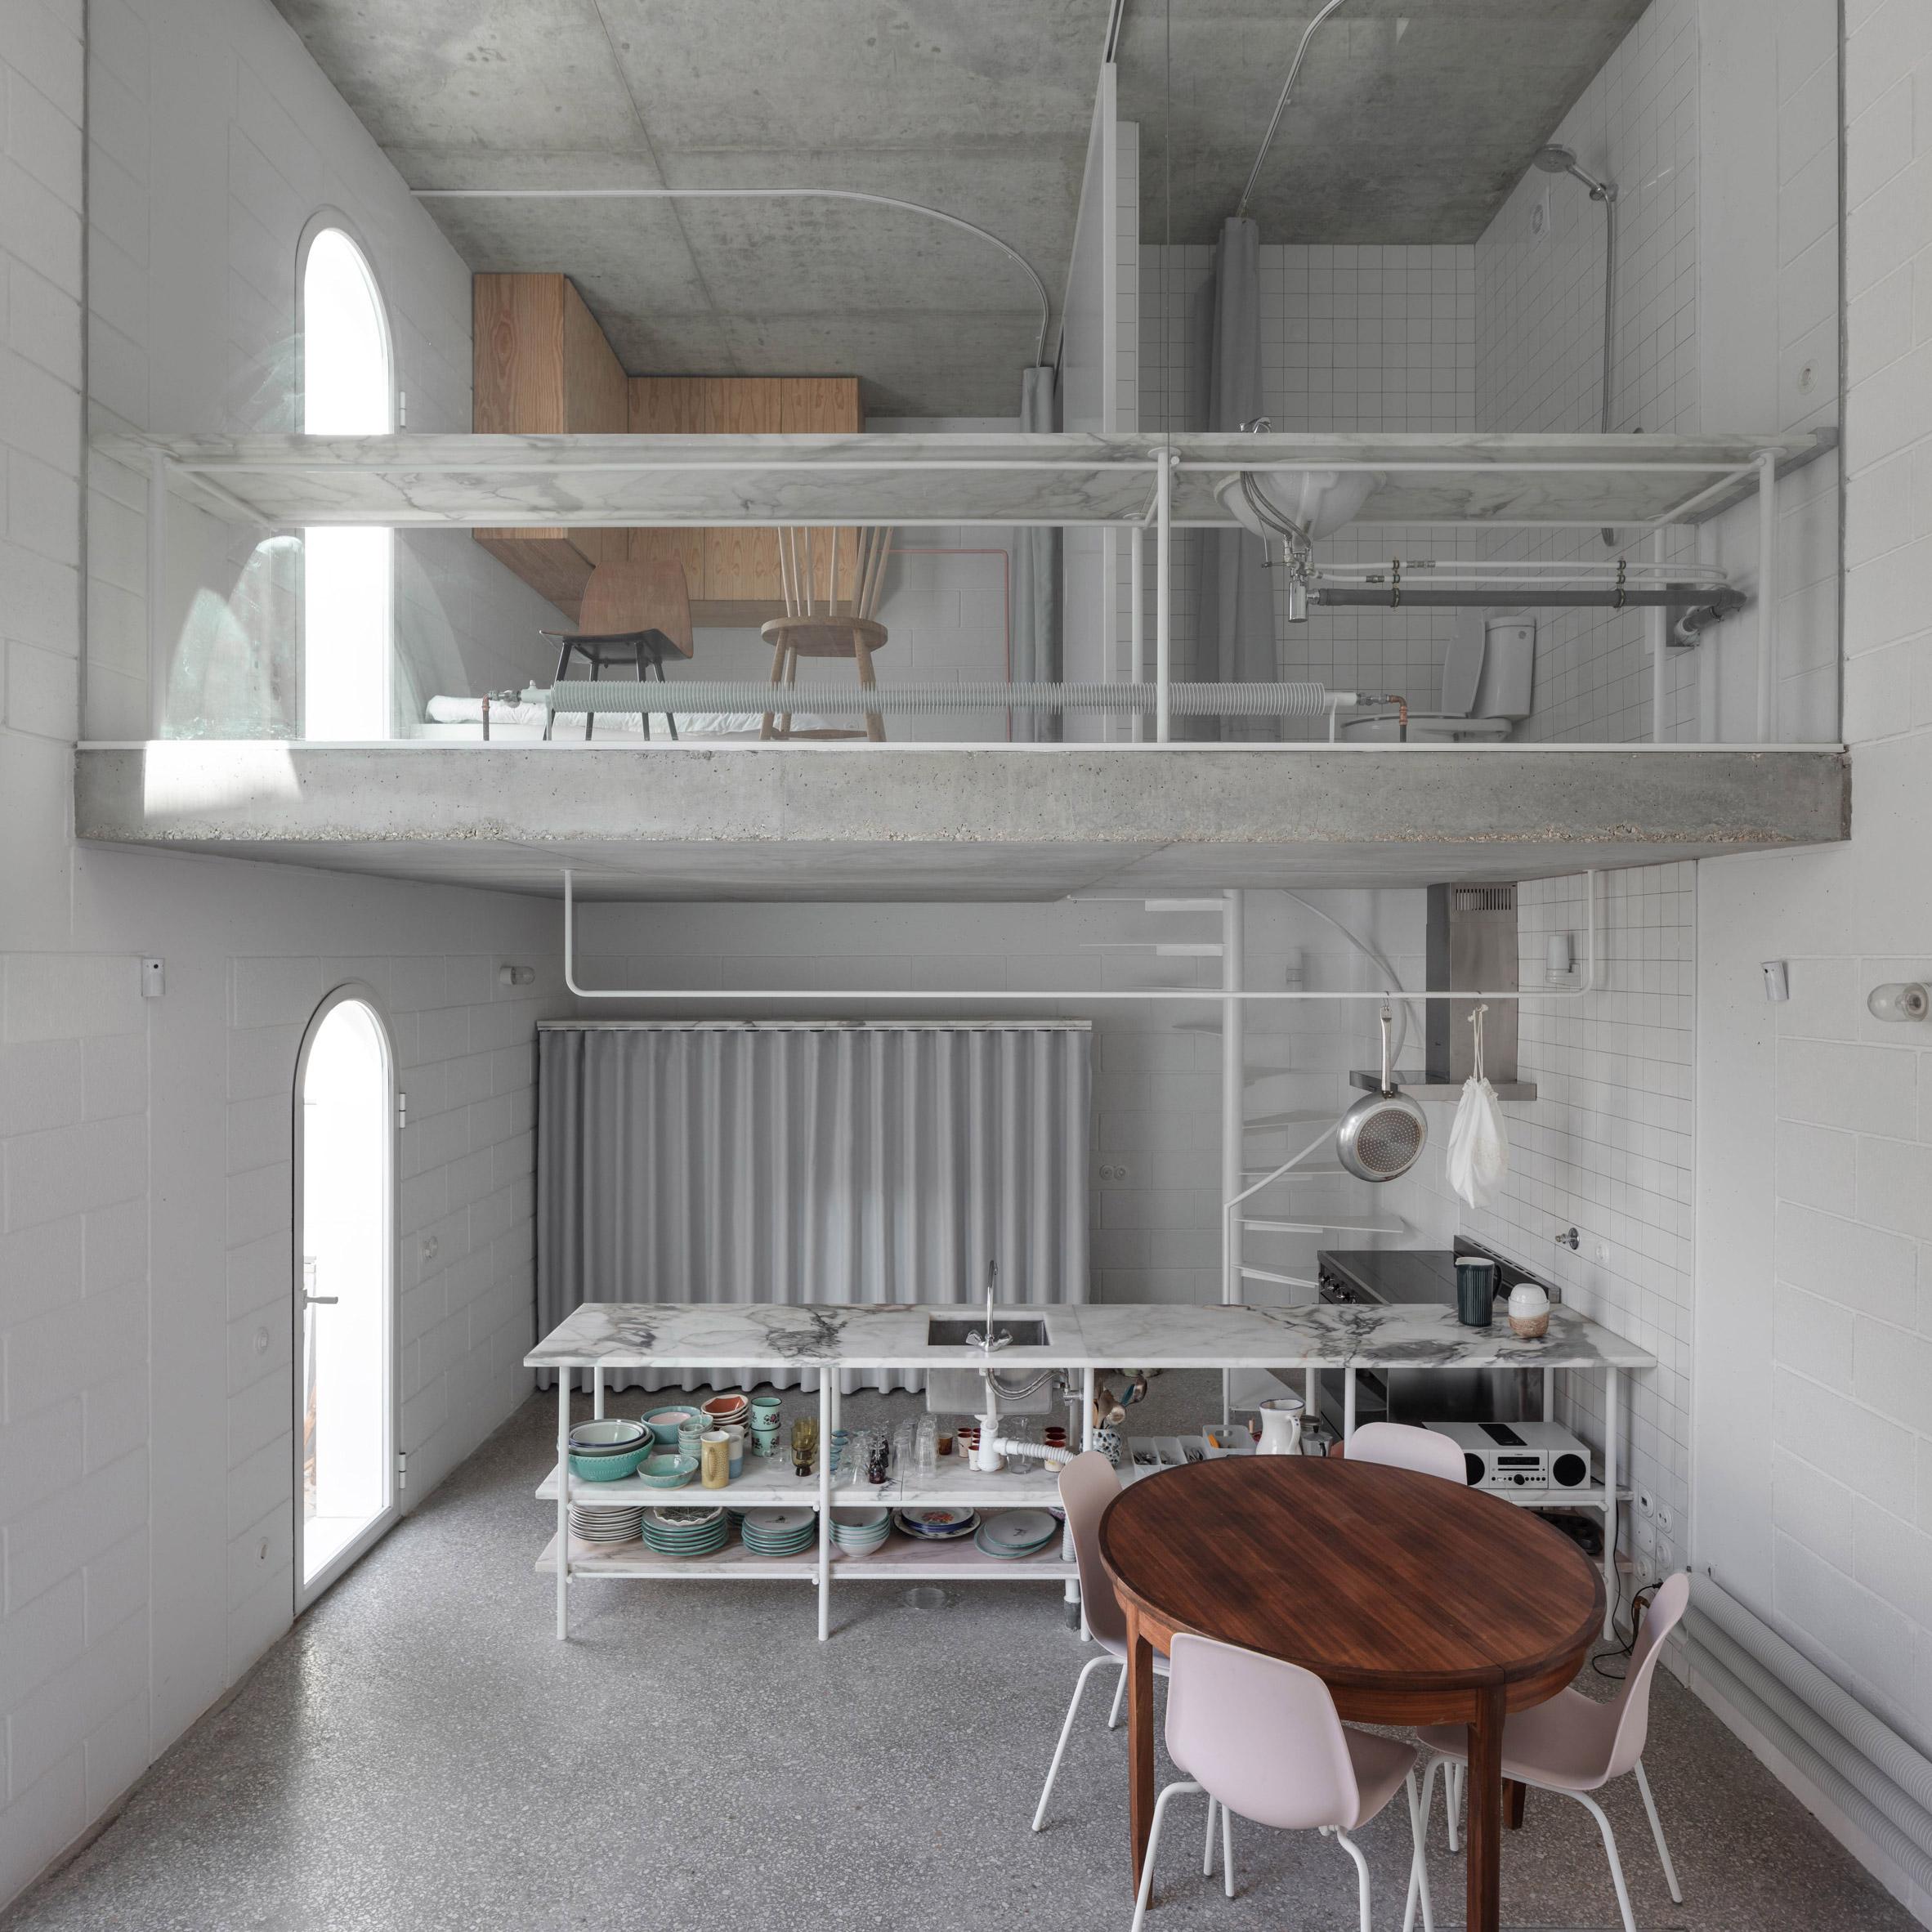 Dodge House by Leopold Banchini and Daniel Zamarbide